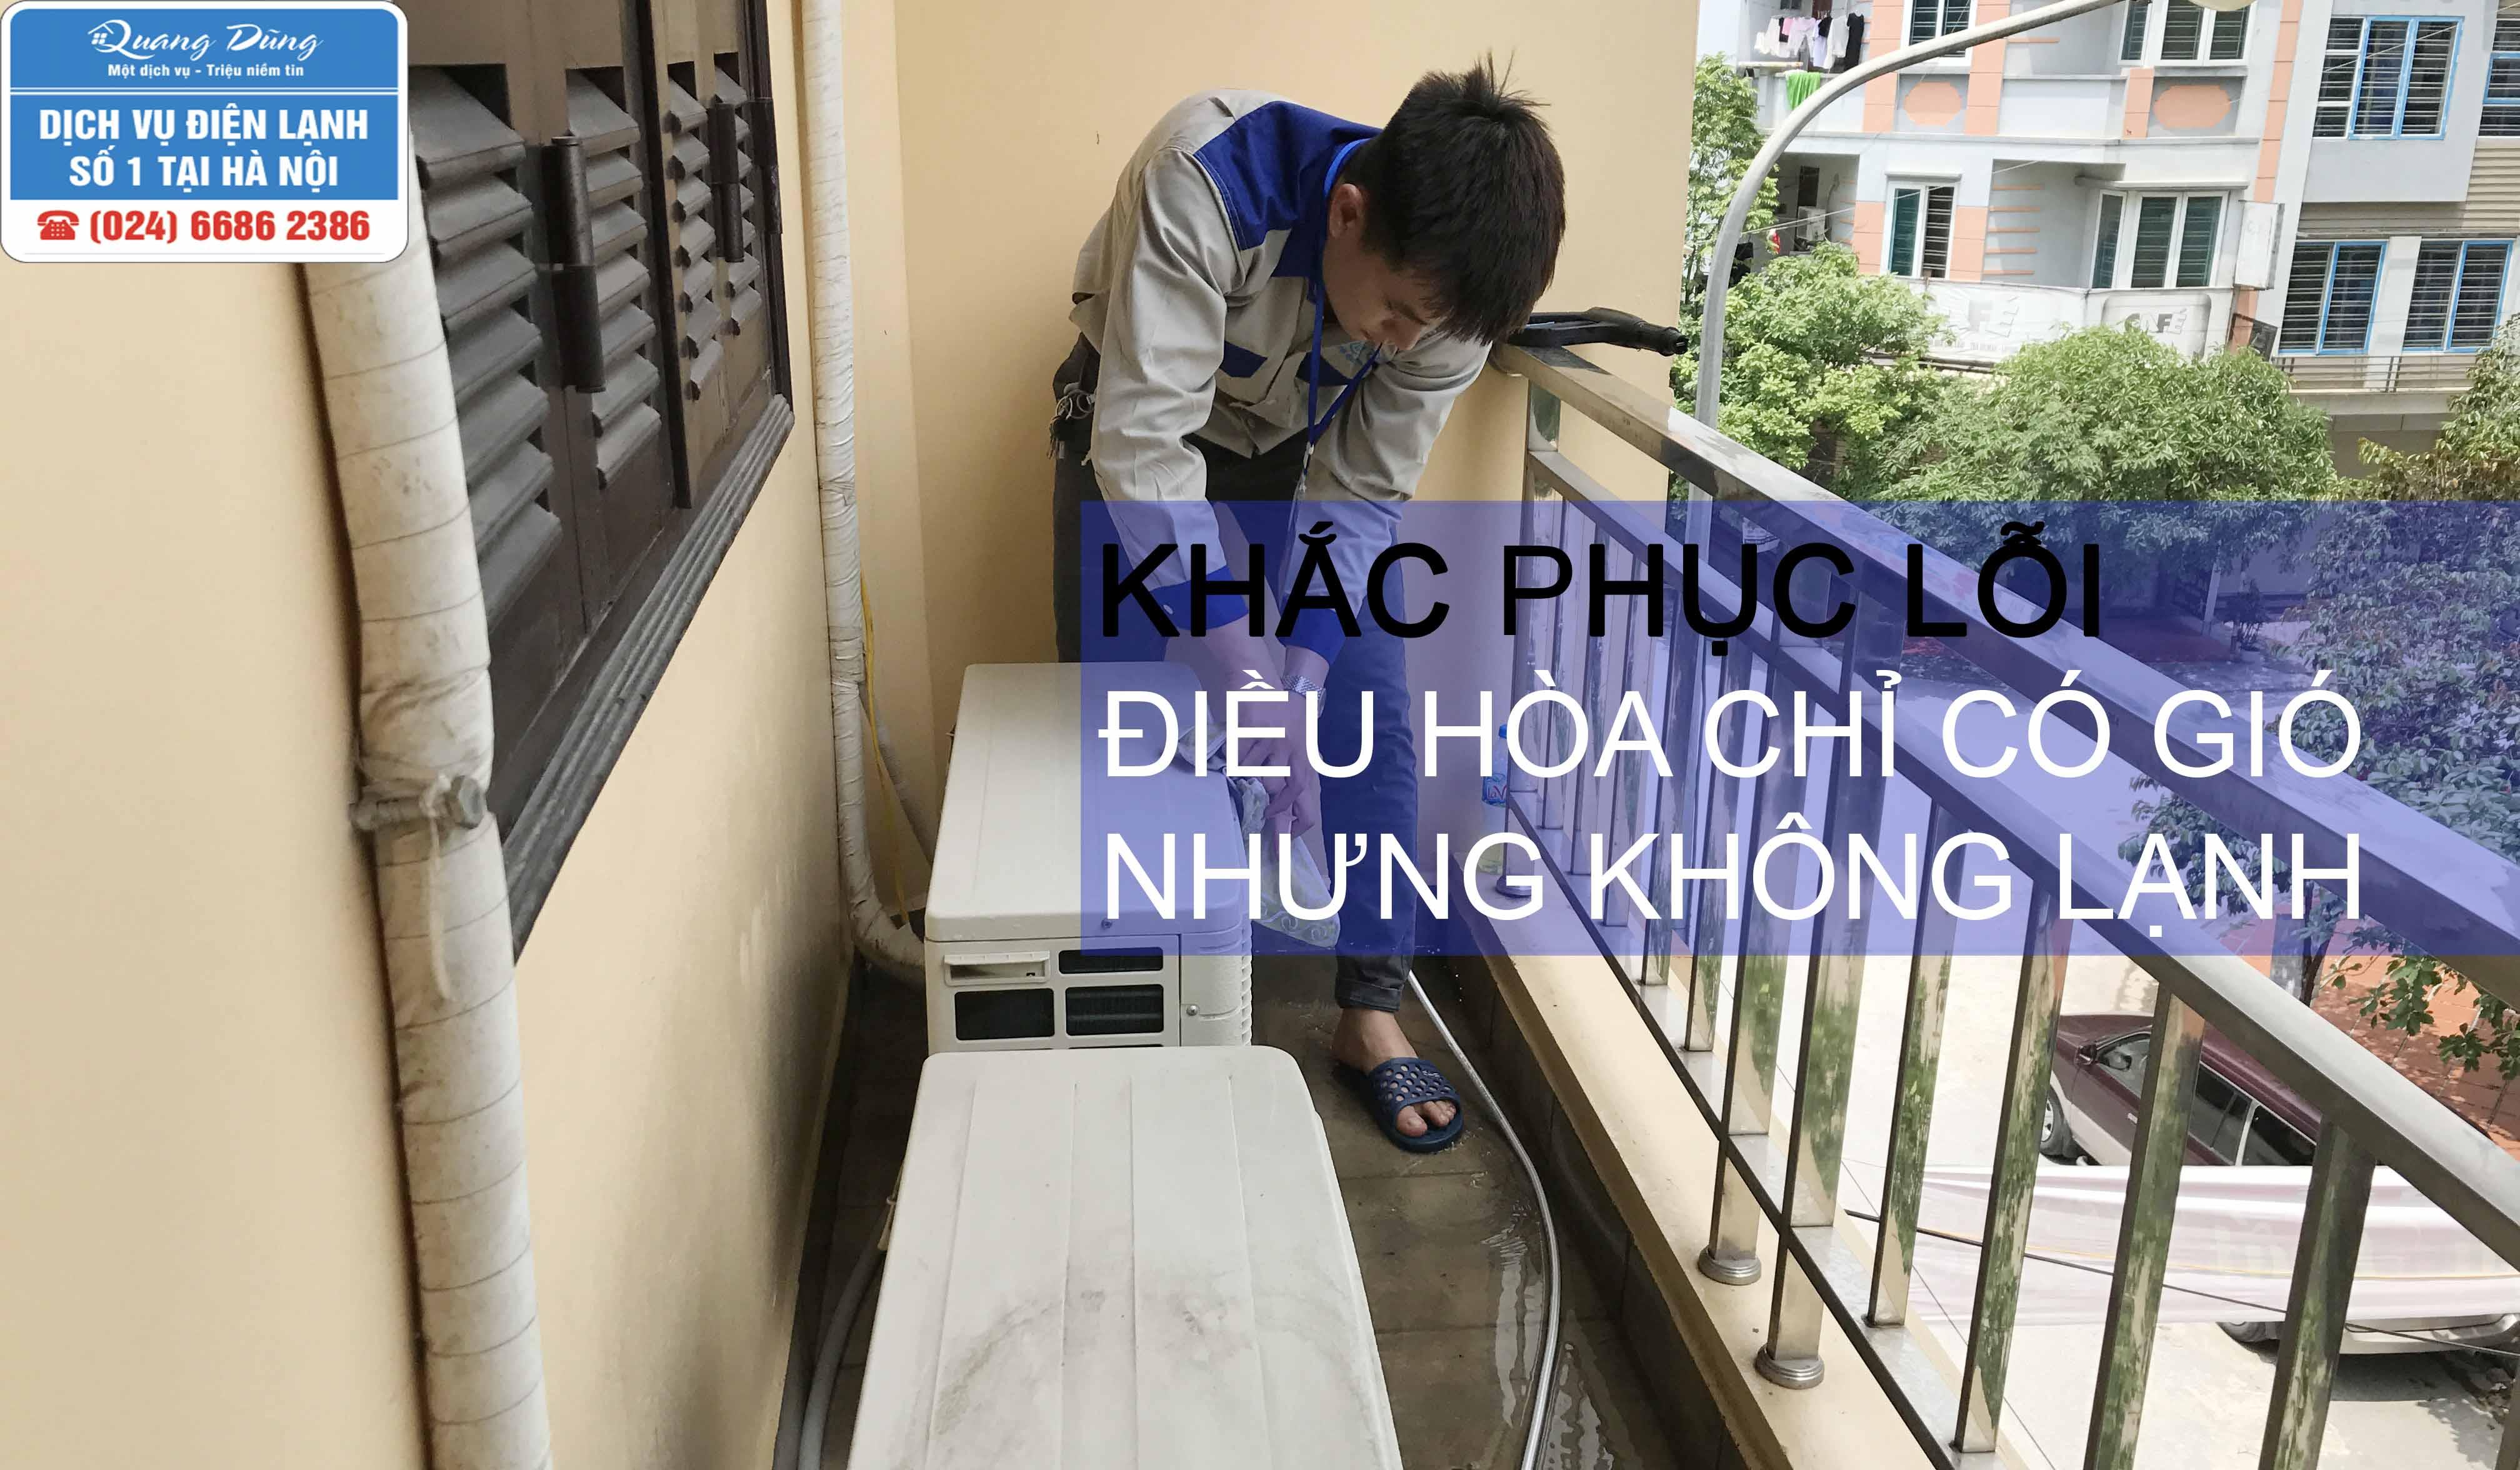 dieu hoa chi co gio nhung khong lanh